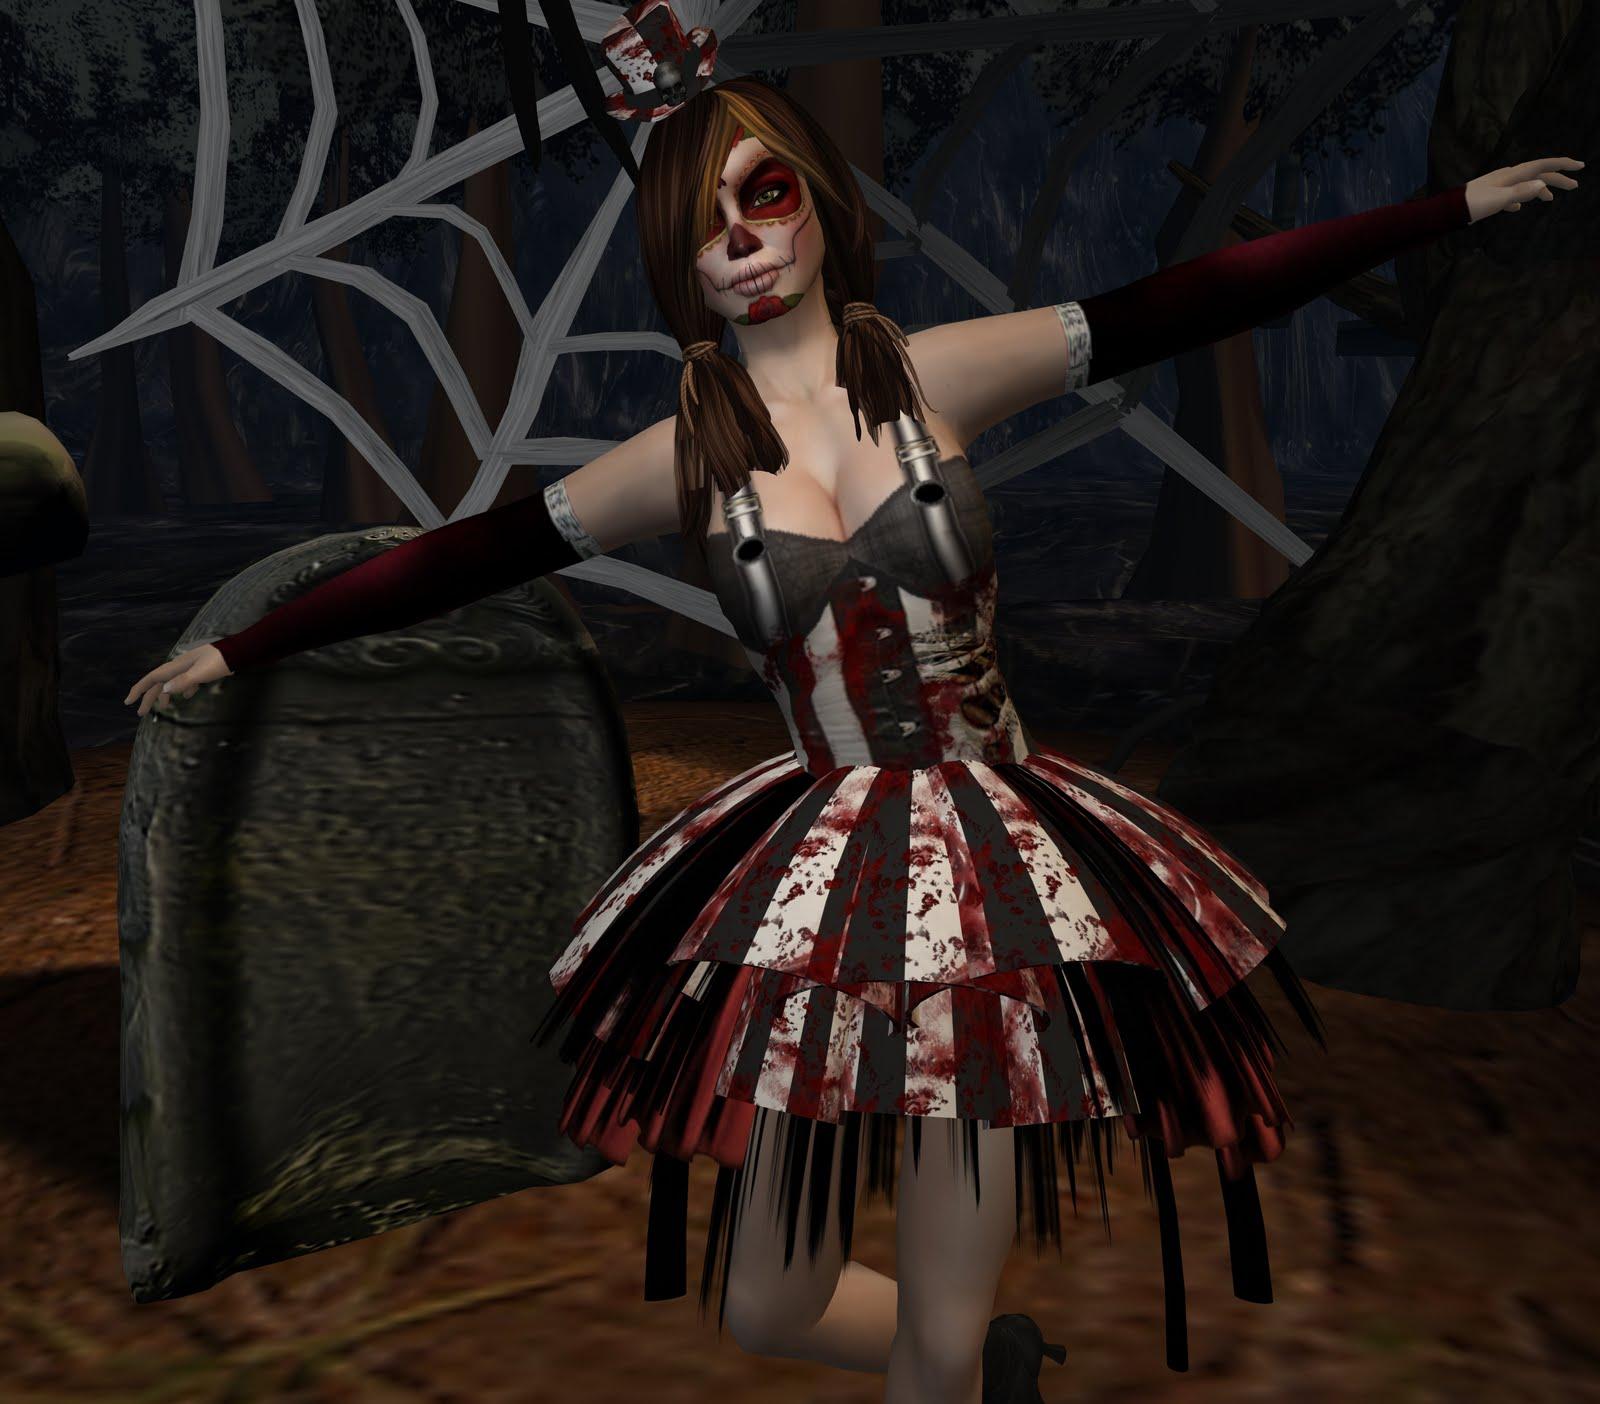 black voodoo doll costume - photo #39